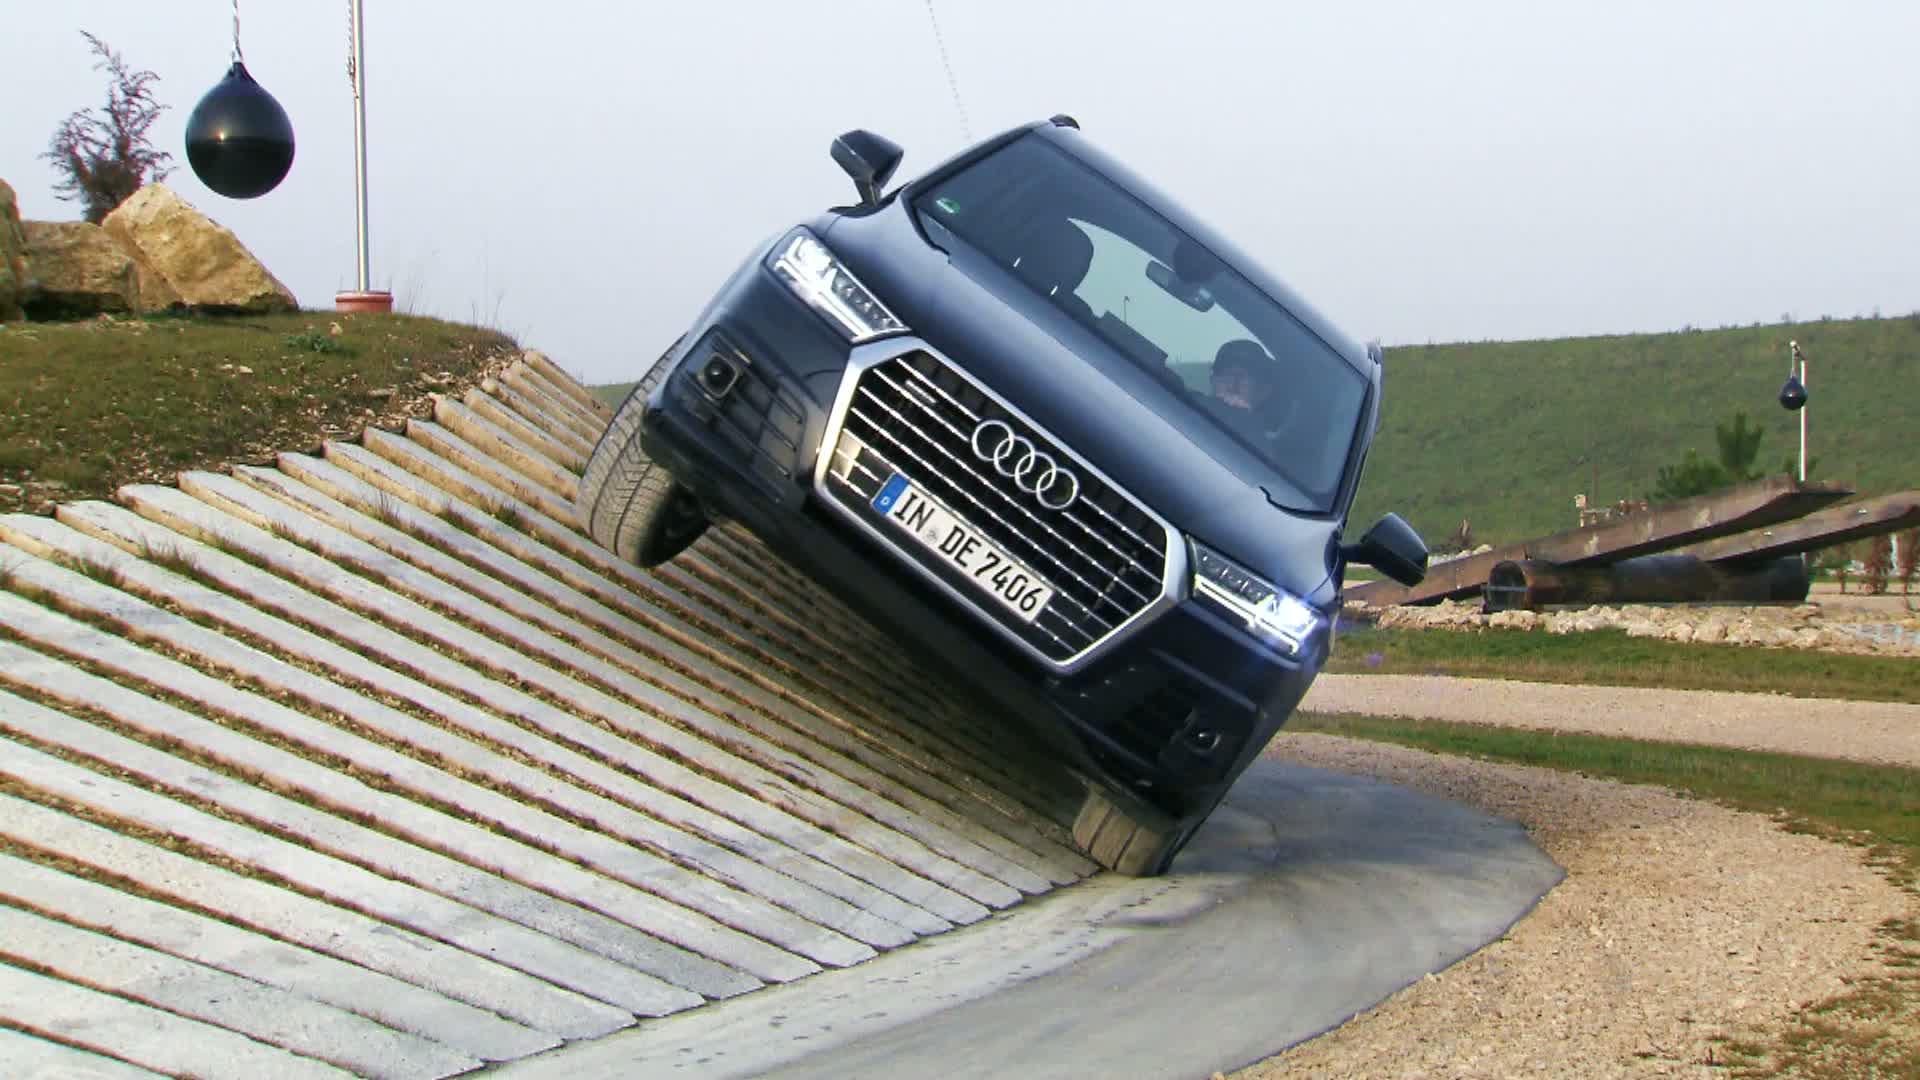 Audi quattro story part 2 - Extreme conditions